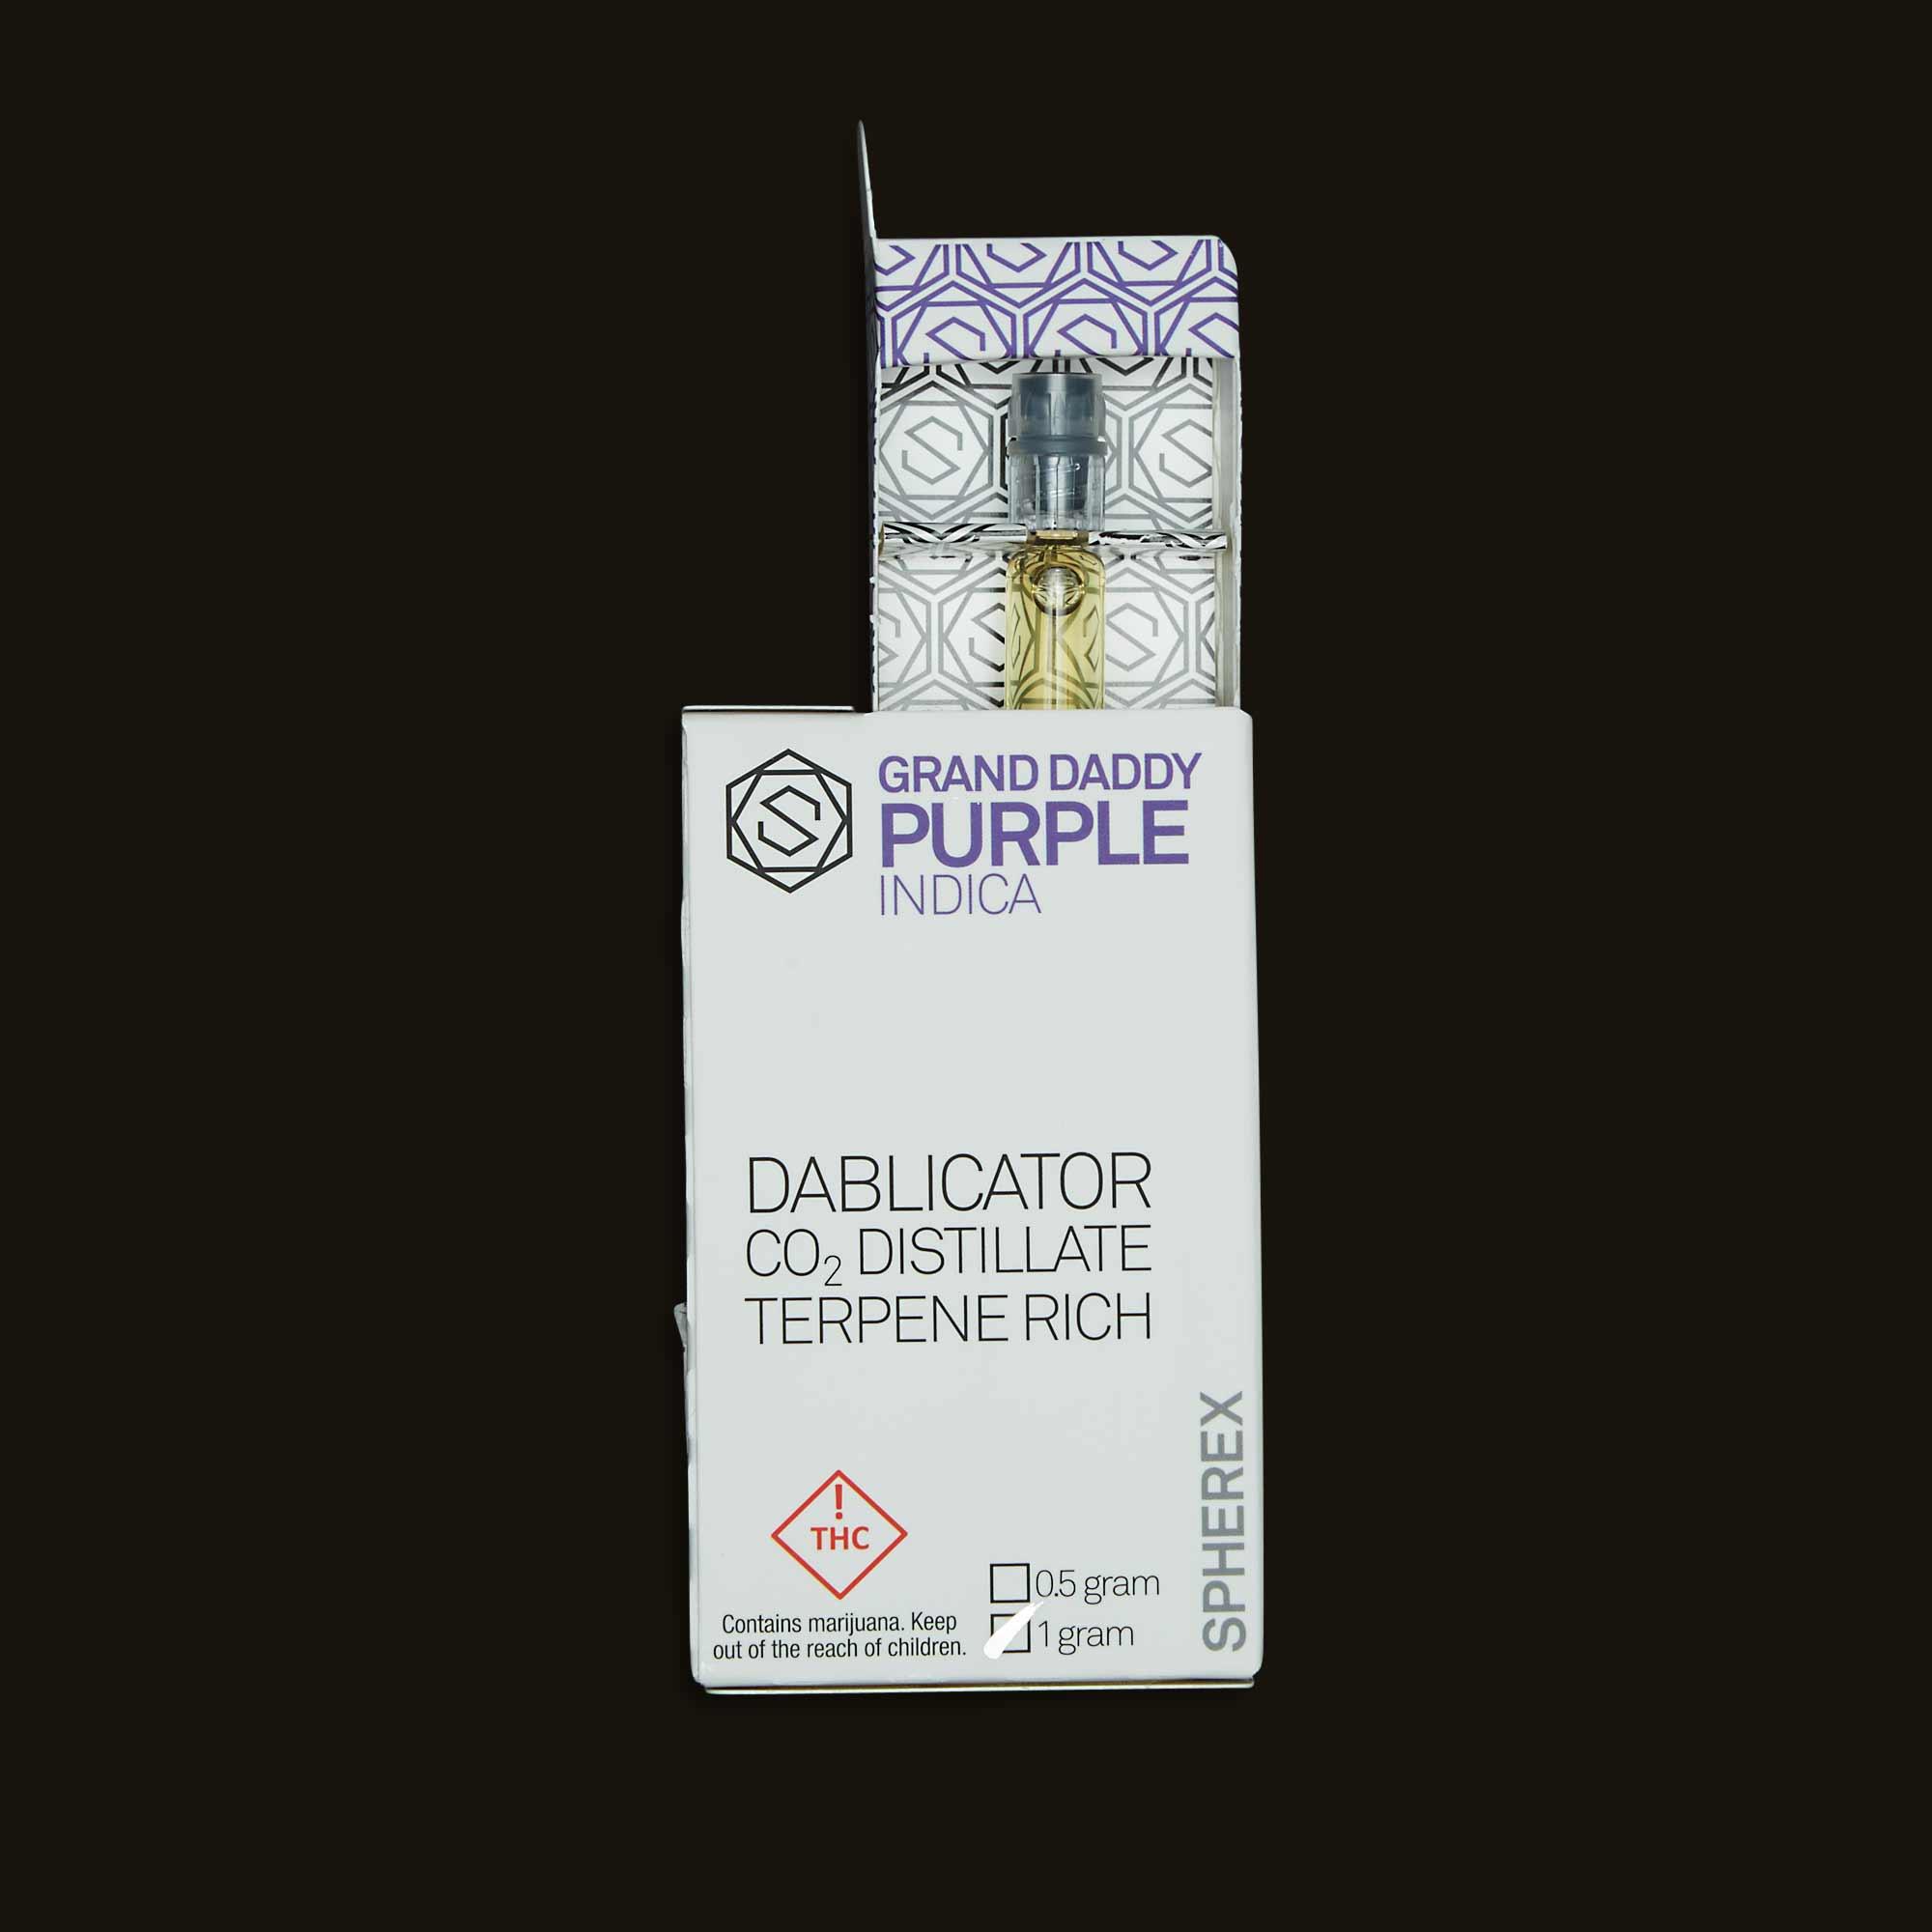 Spherex Grand Daddy Purple Dablicator